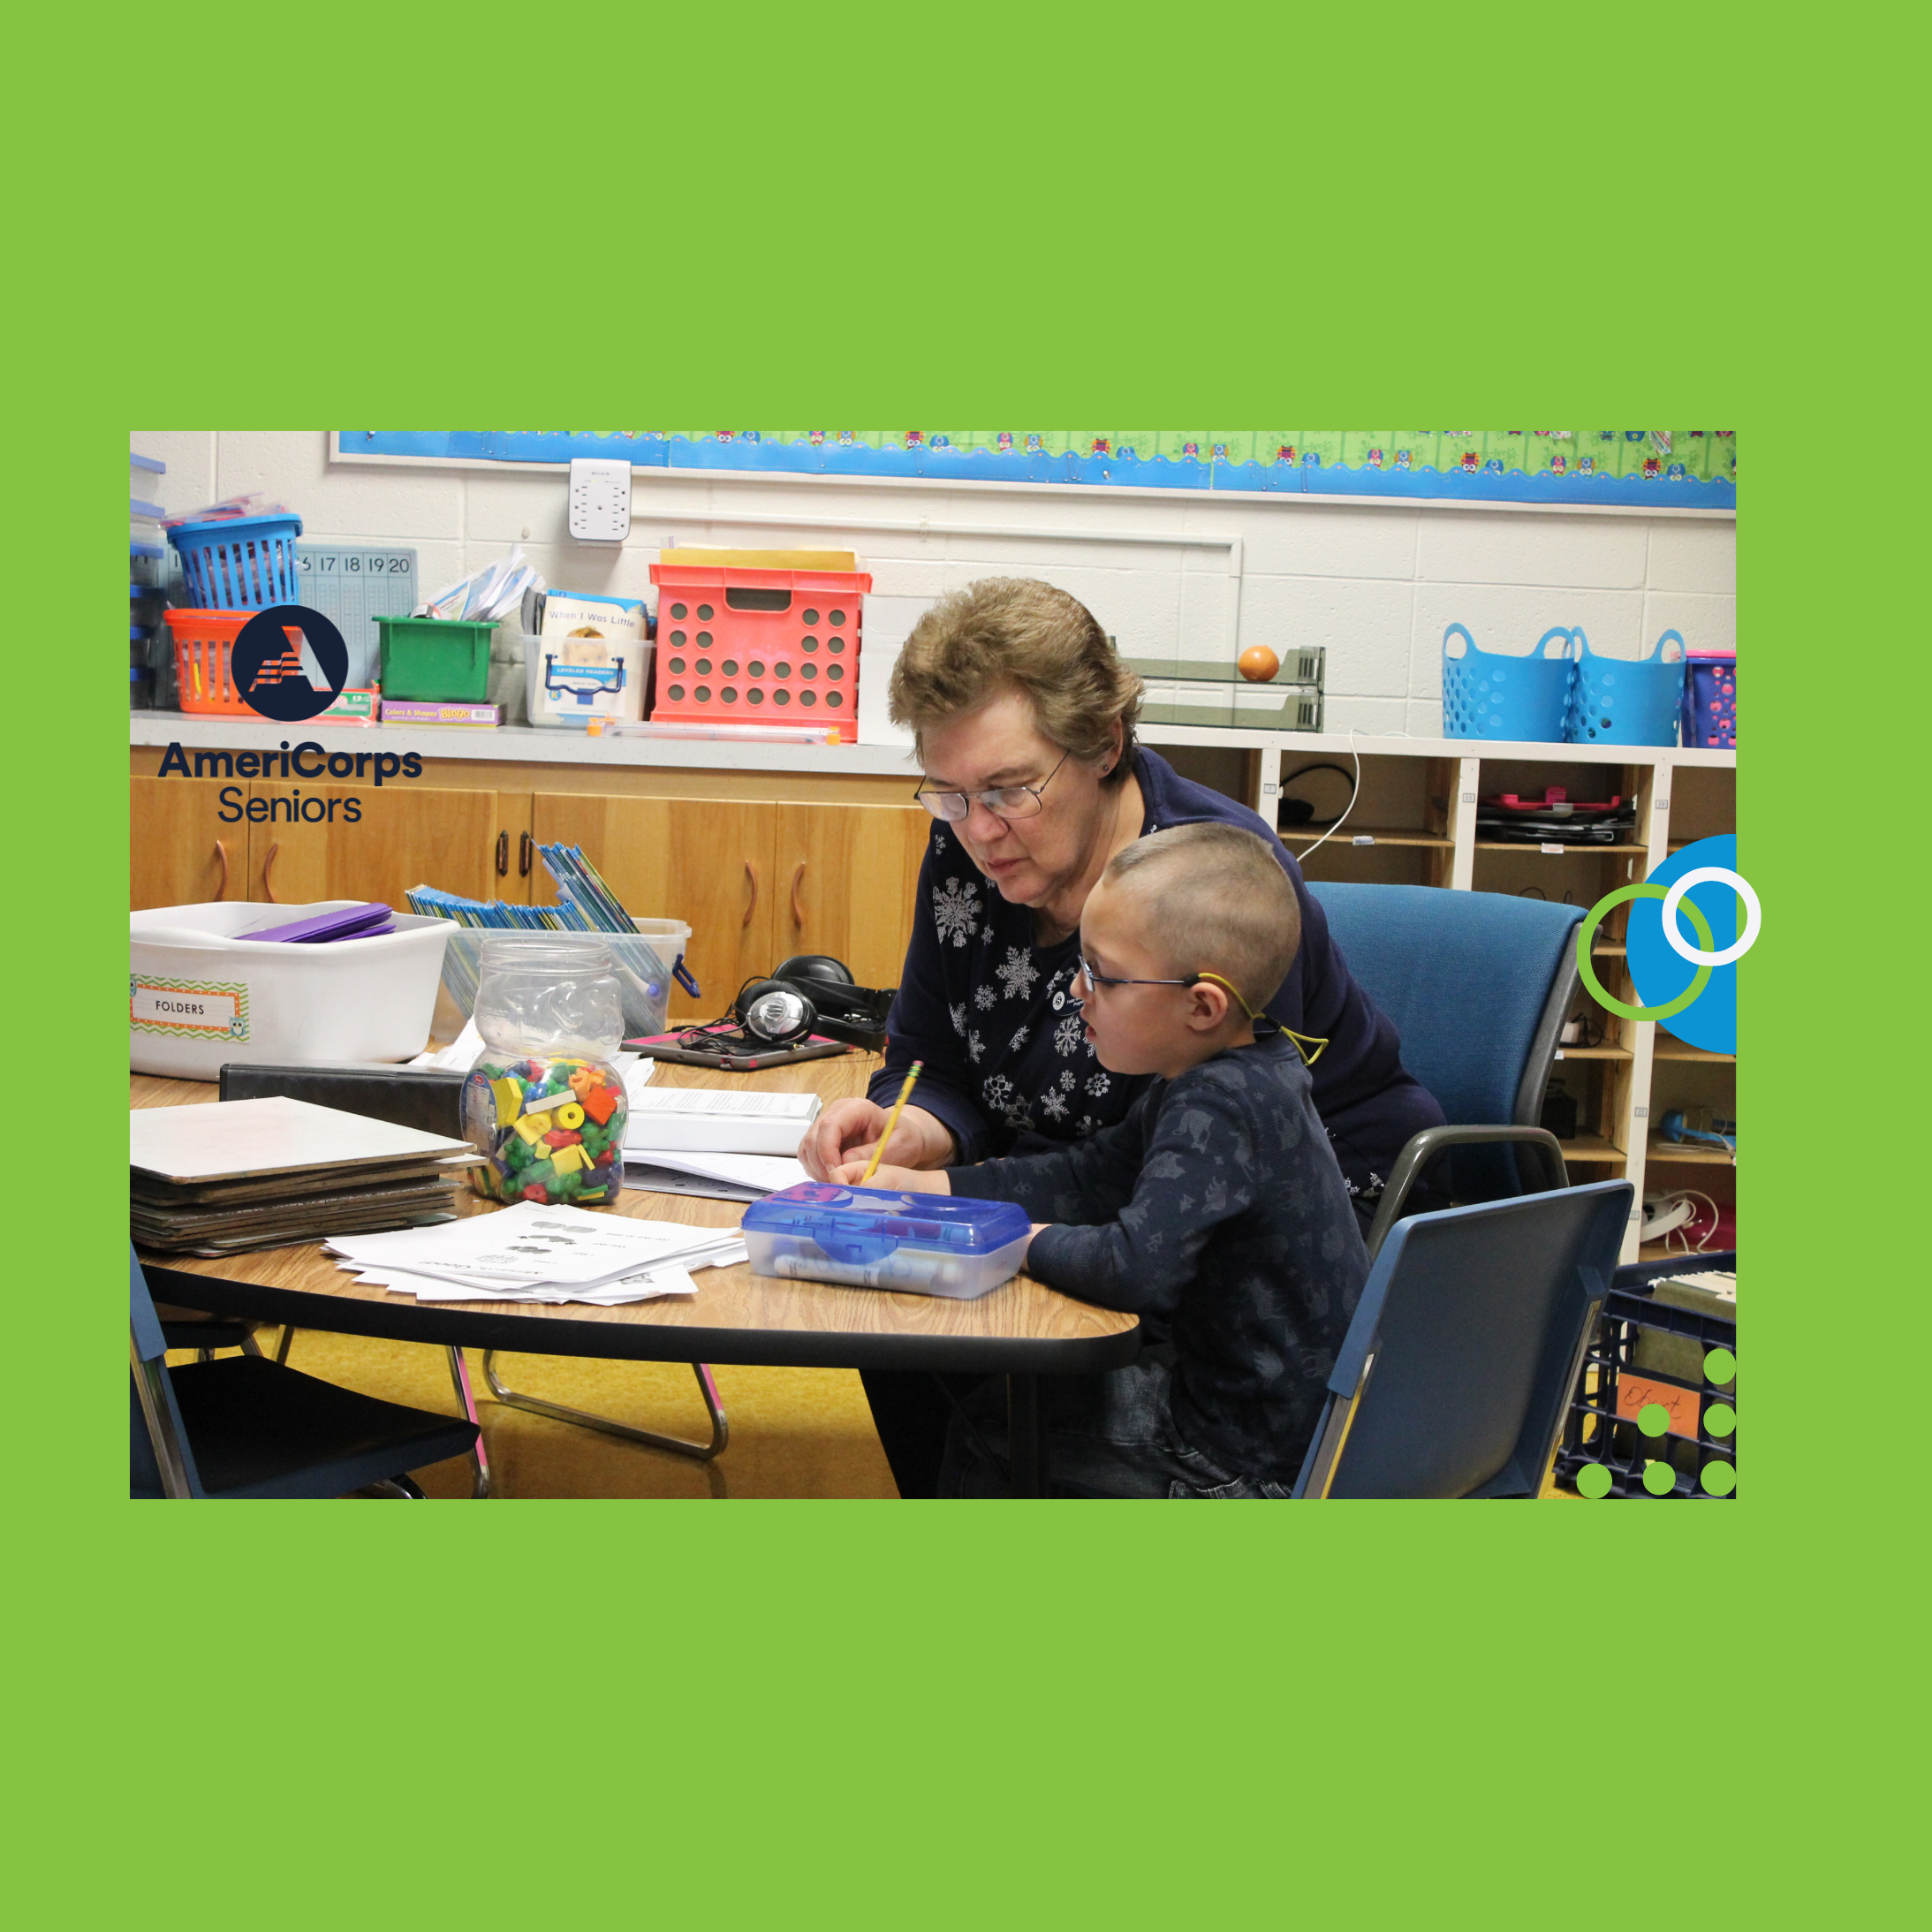 Volunteer with AmeriCorps Seniors Foster Grandparent Program